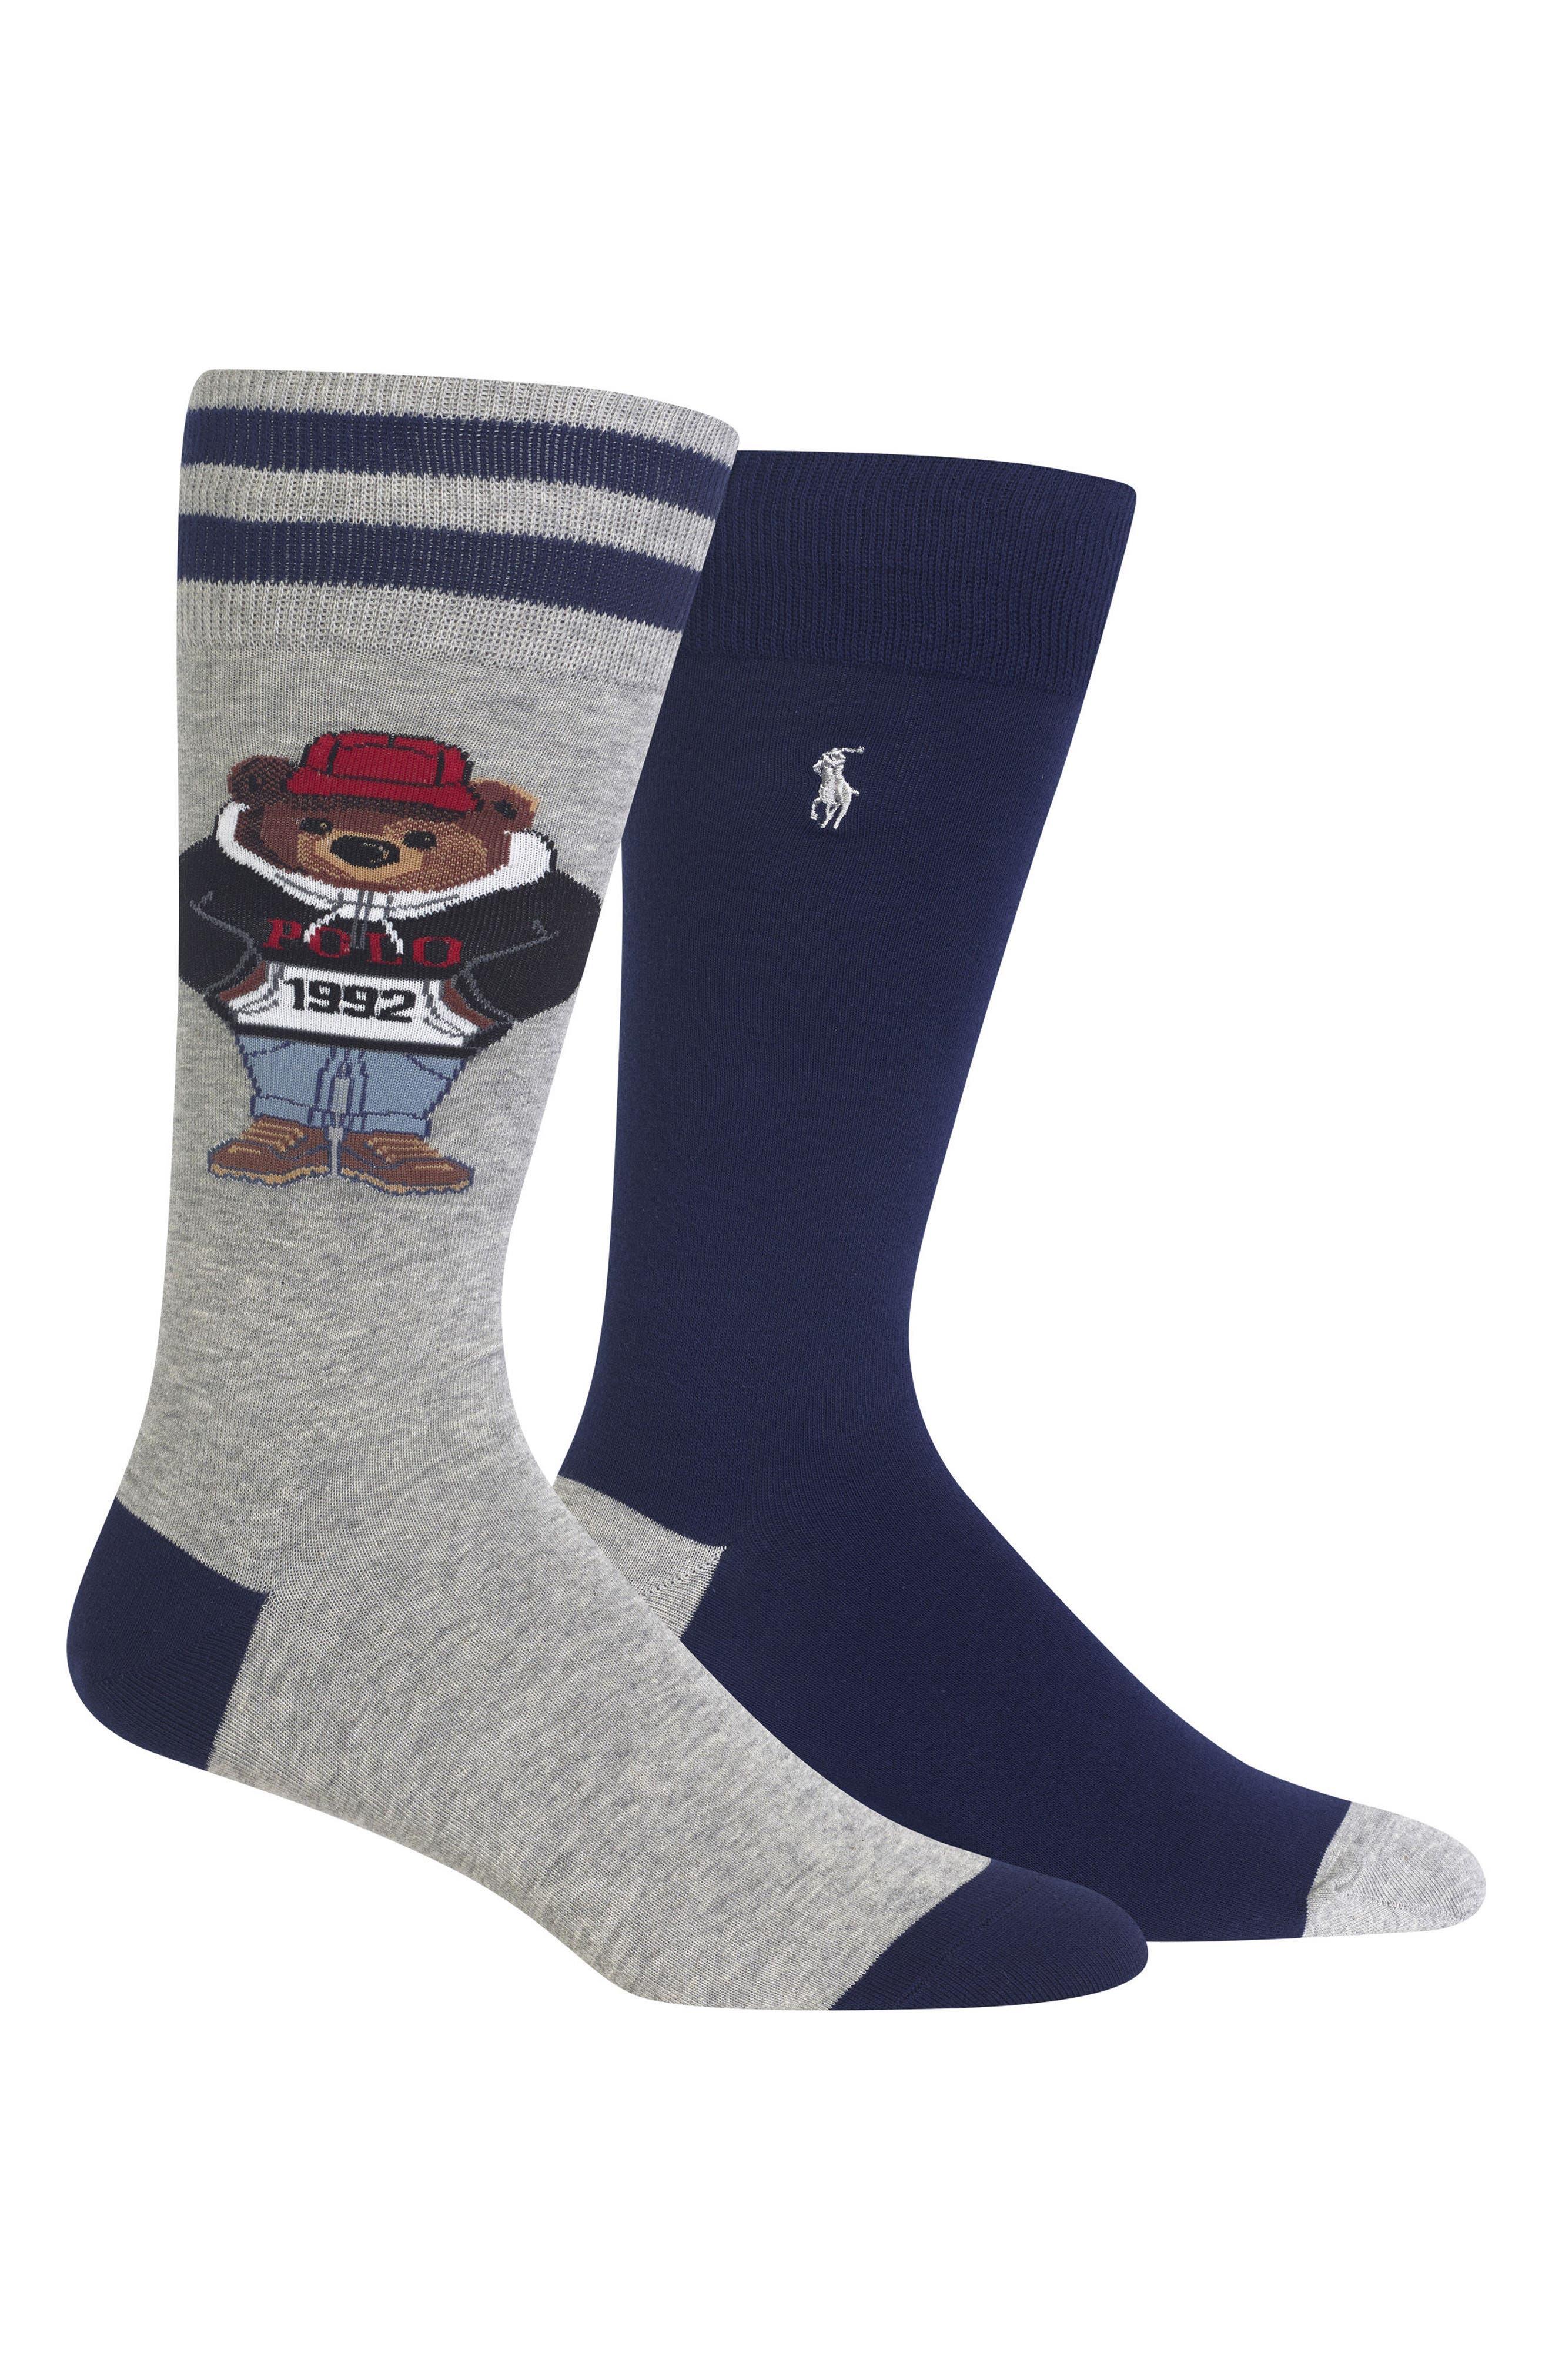 2-Pack Socks,                             Main thumbnail 1, color,                             054